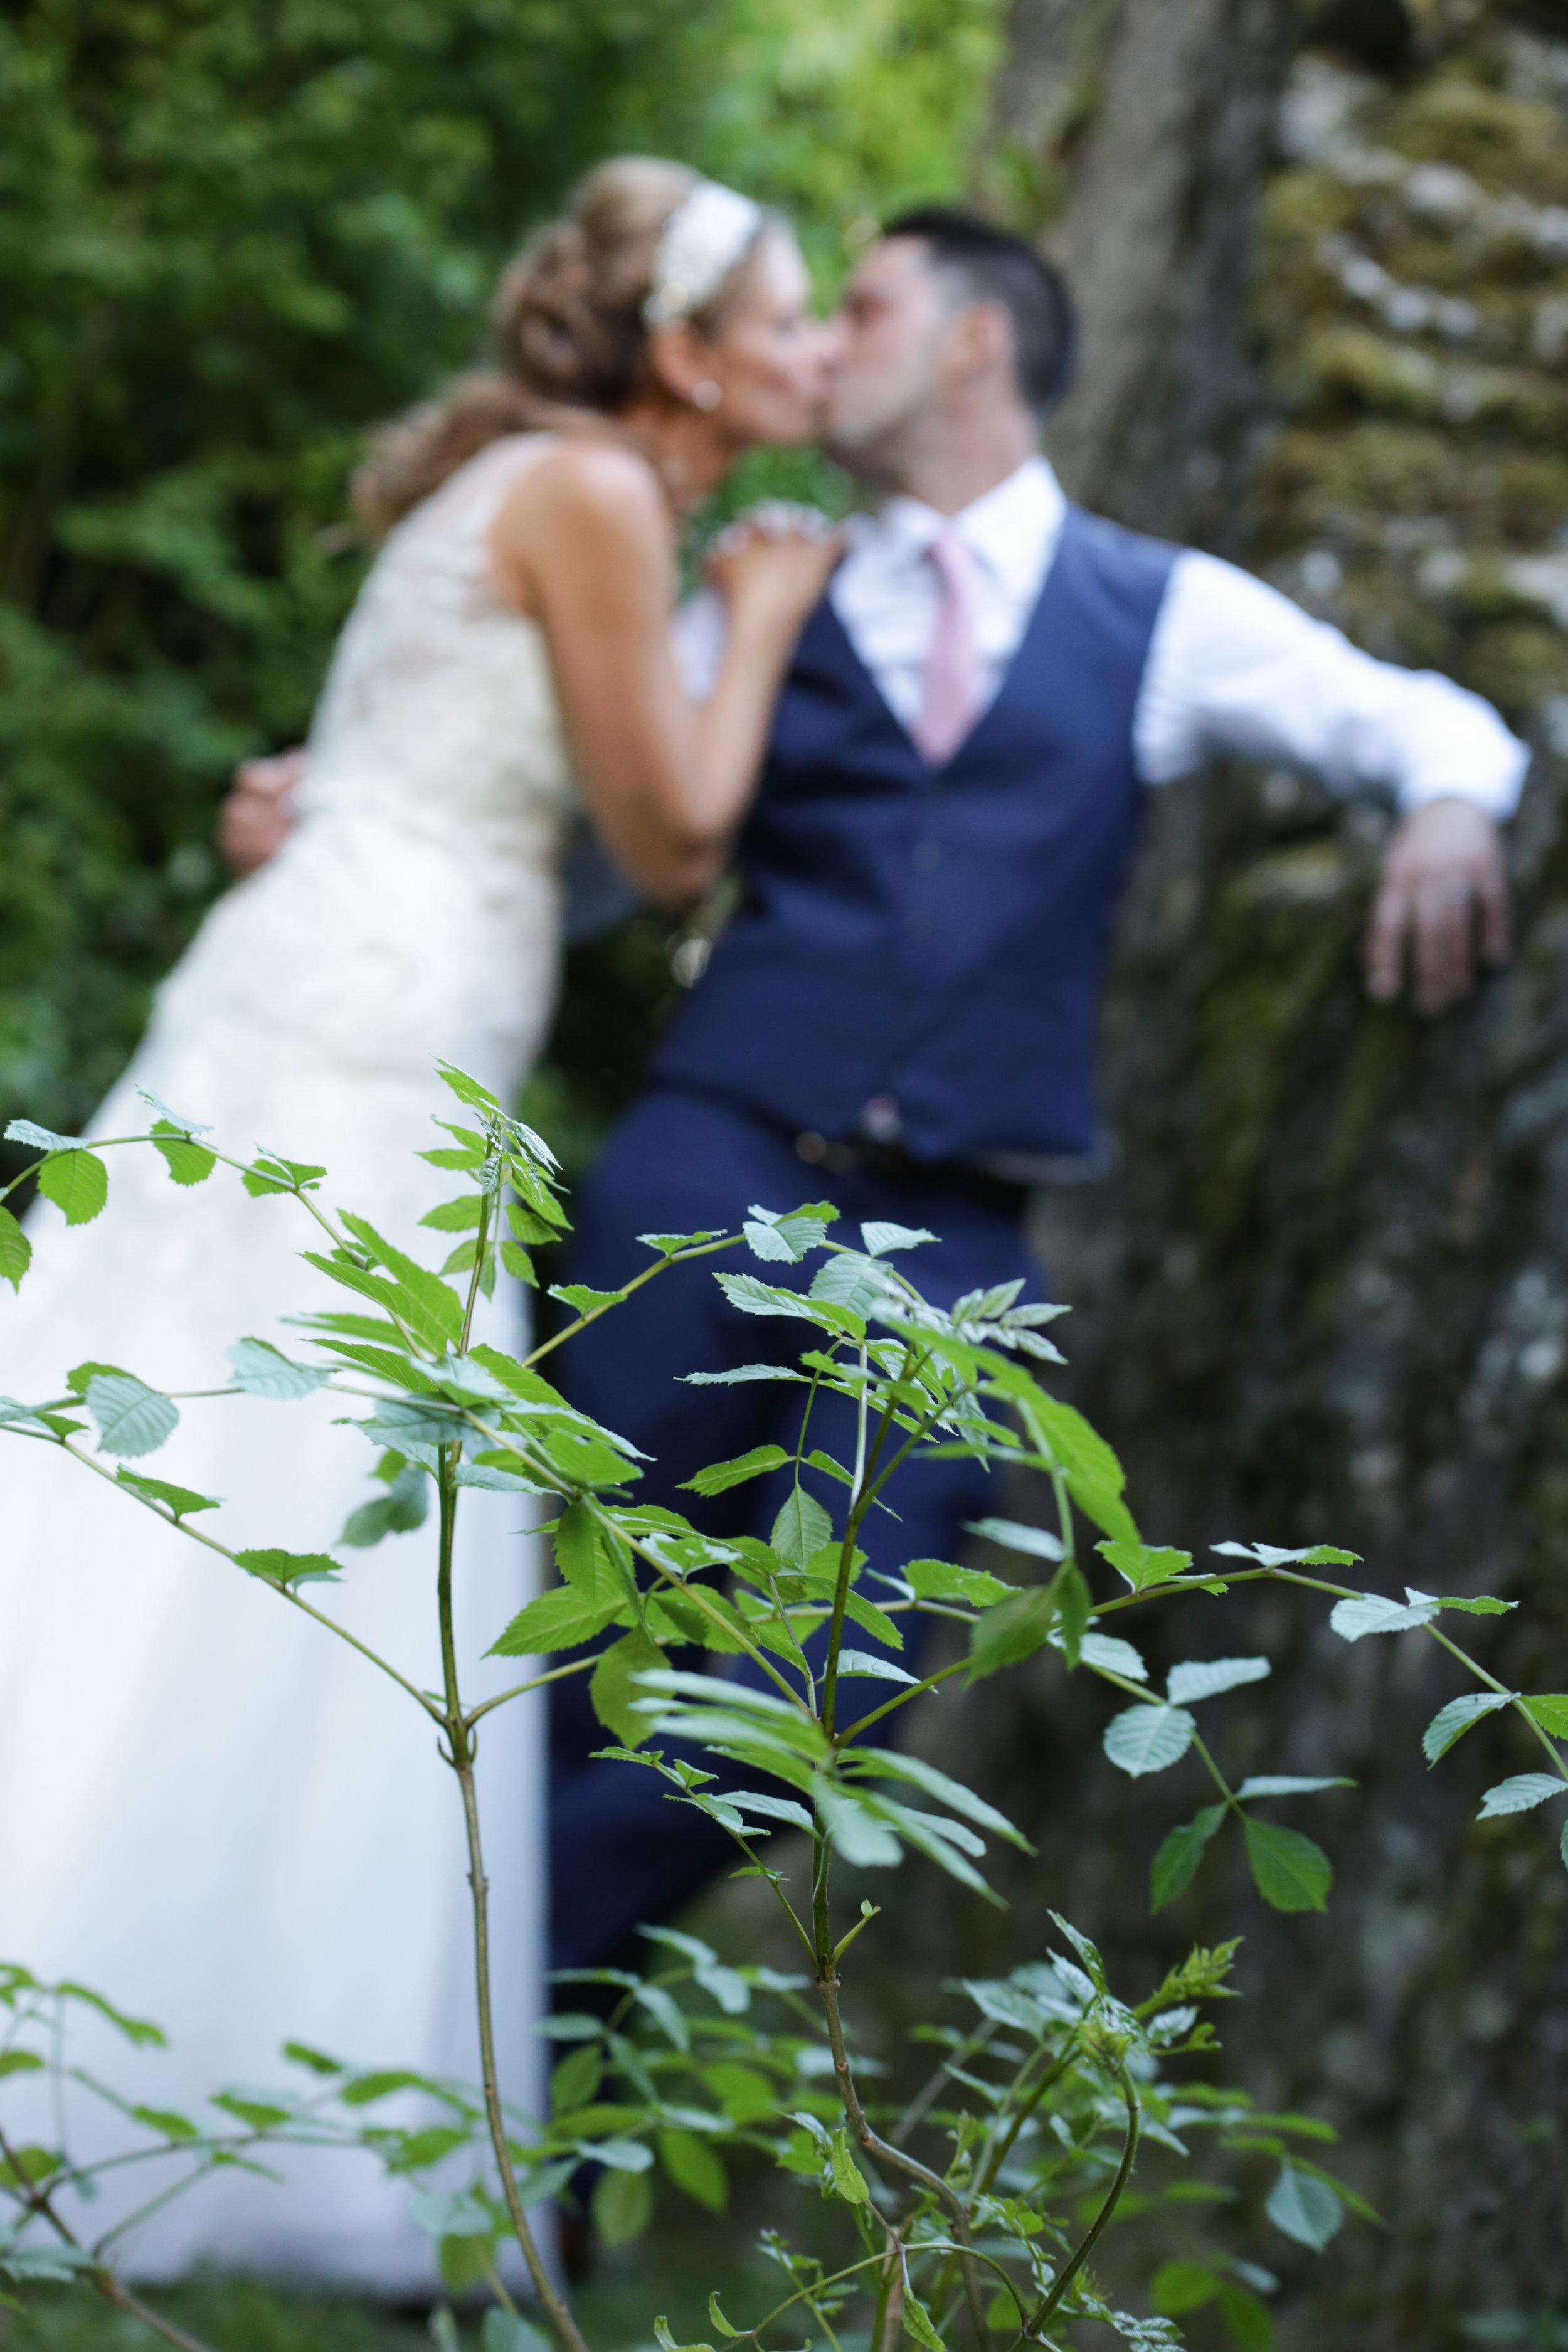 Archbishops Place Maidstone Wedding Photographer10.jpg